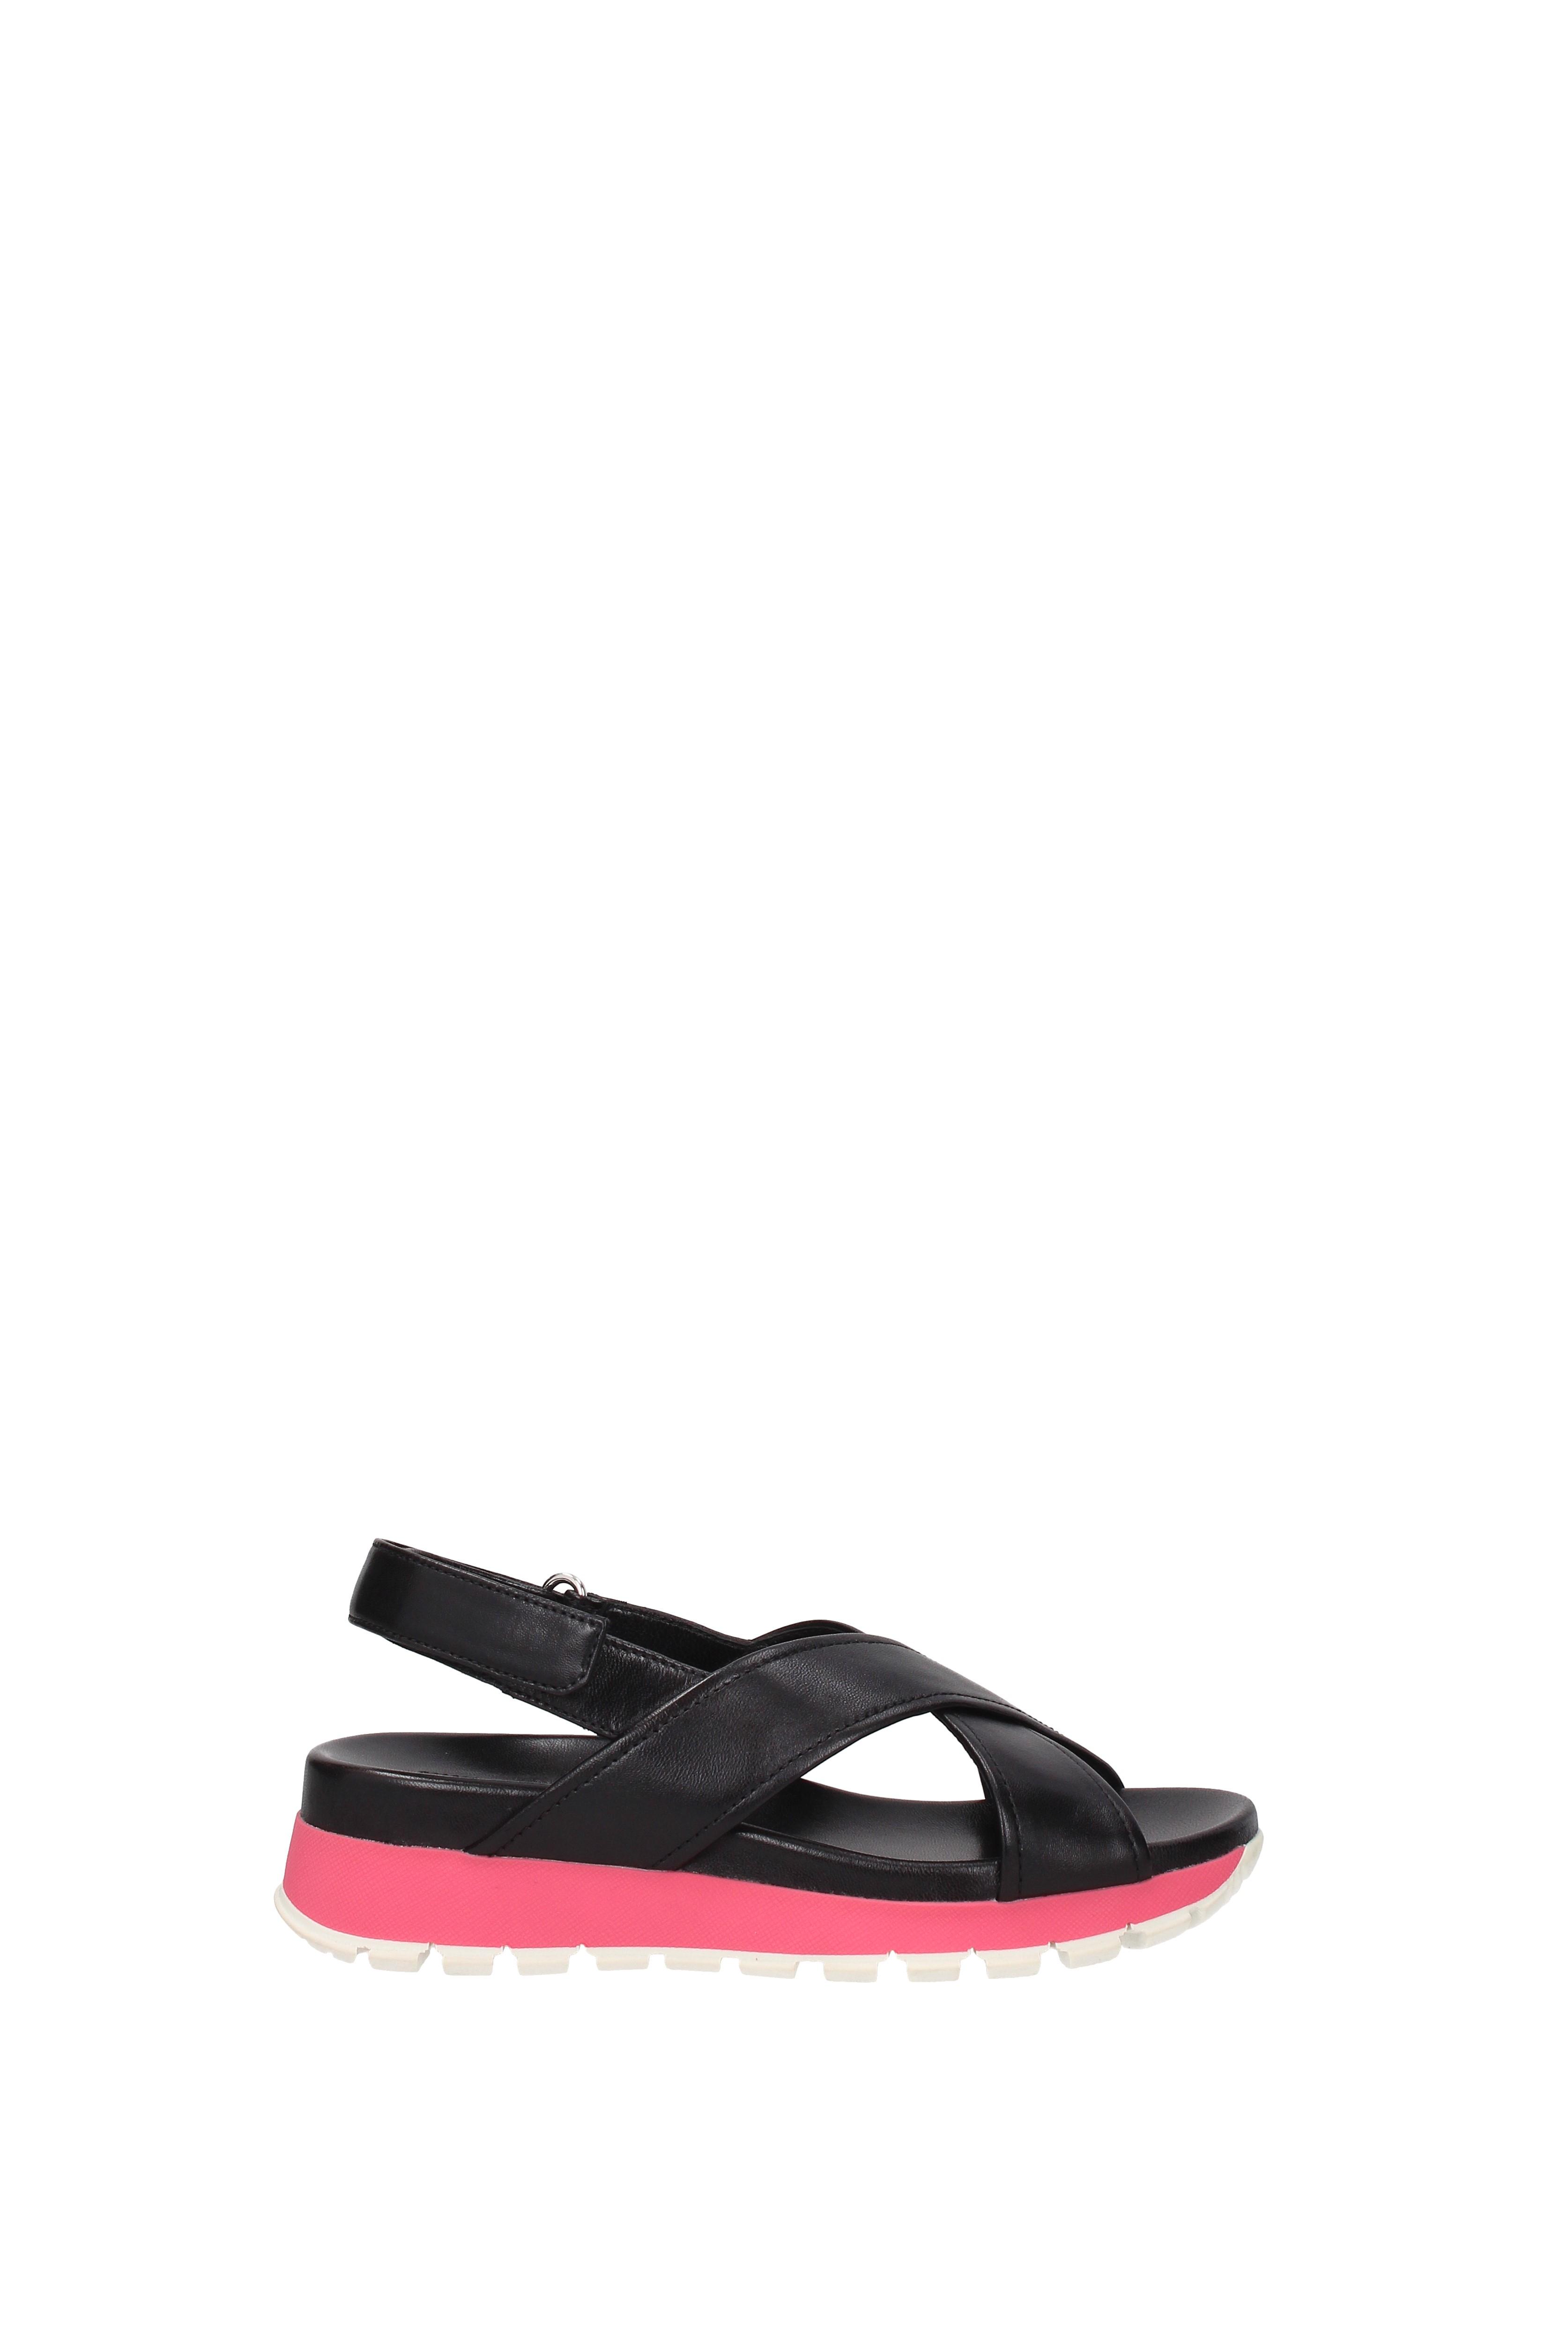 Sandalen Prada Damen - - Damen Leder (3X6022) 54ce1a